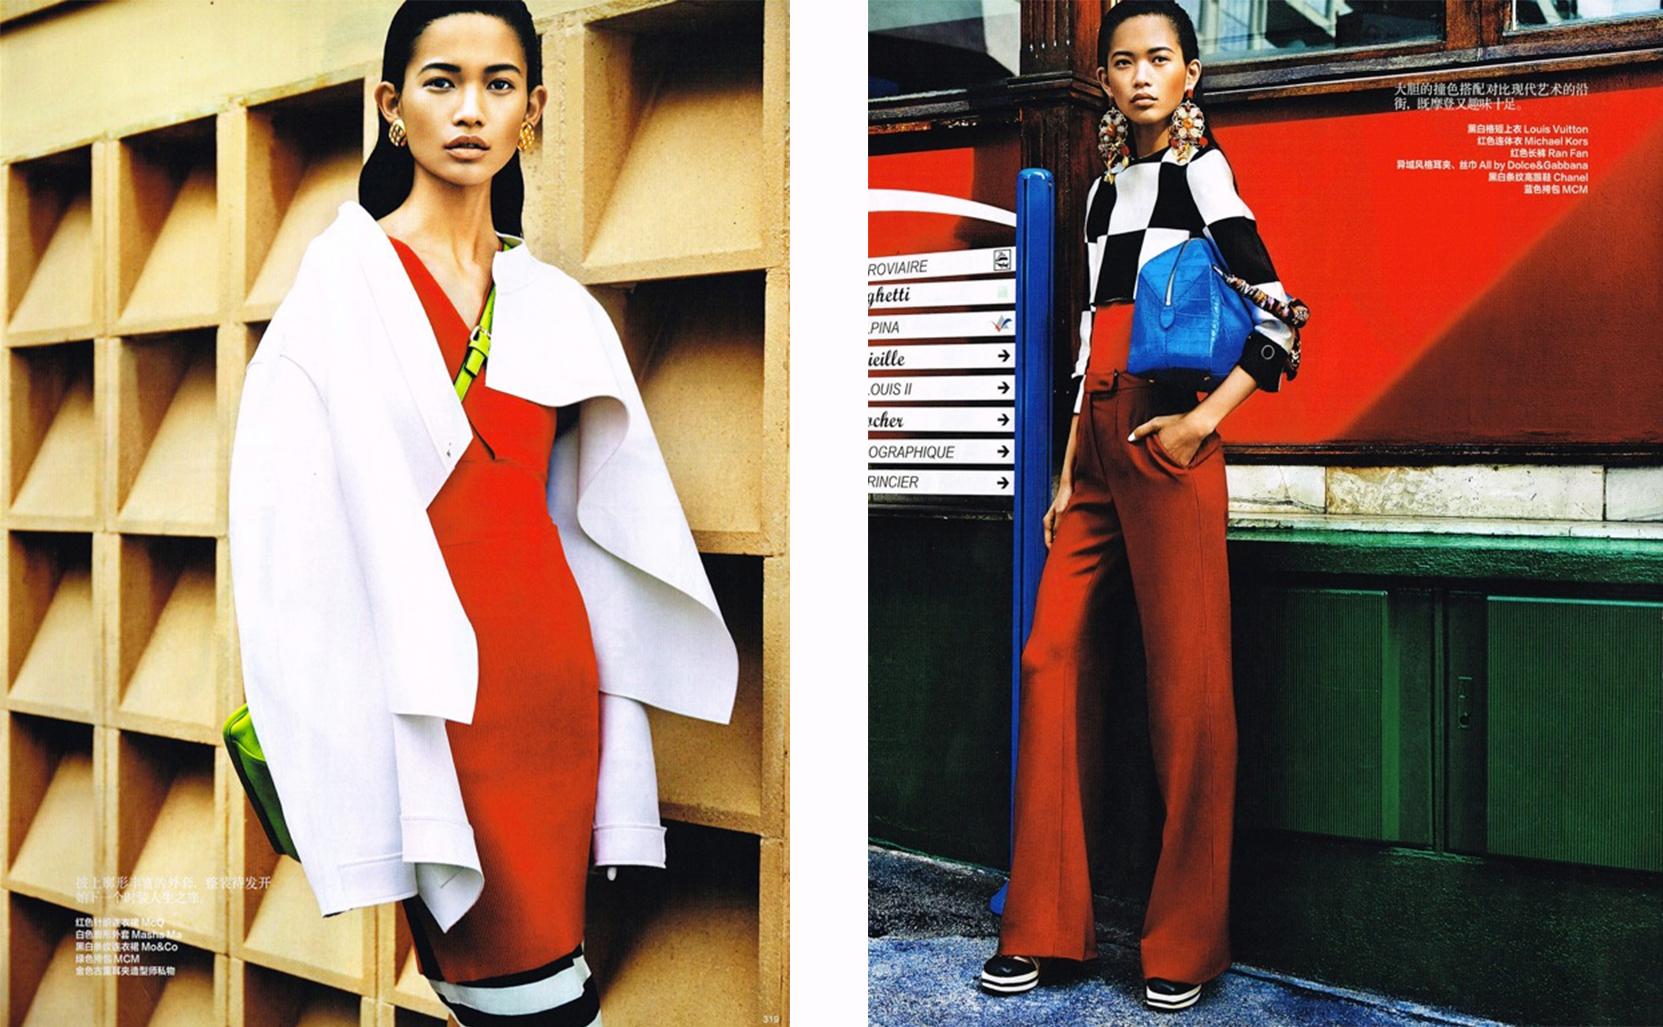 china photo rep, china photo production, photography representation china, photo studio beijing